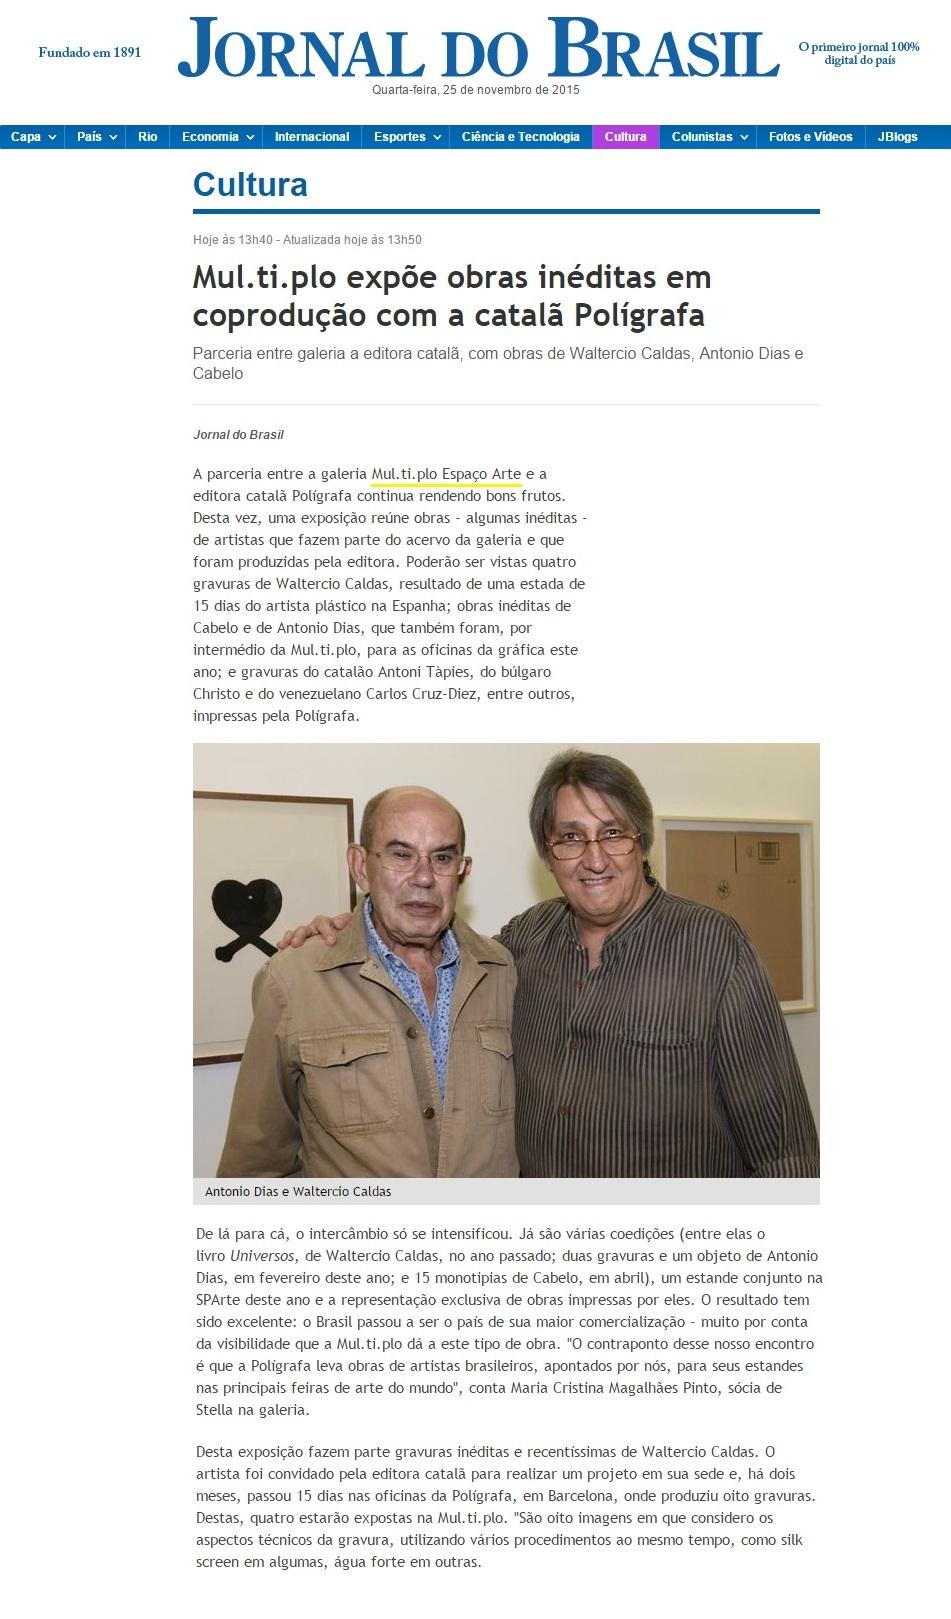 MUL.TI.PLO ESPAÇO ARTE NO JORNAL DO BRASIL 25-11.jpg